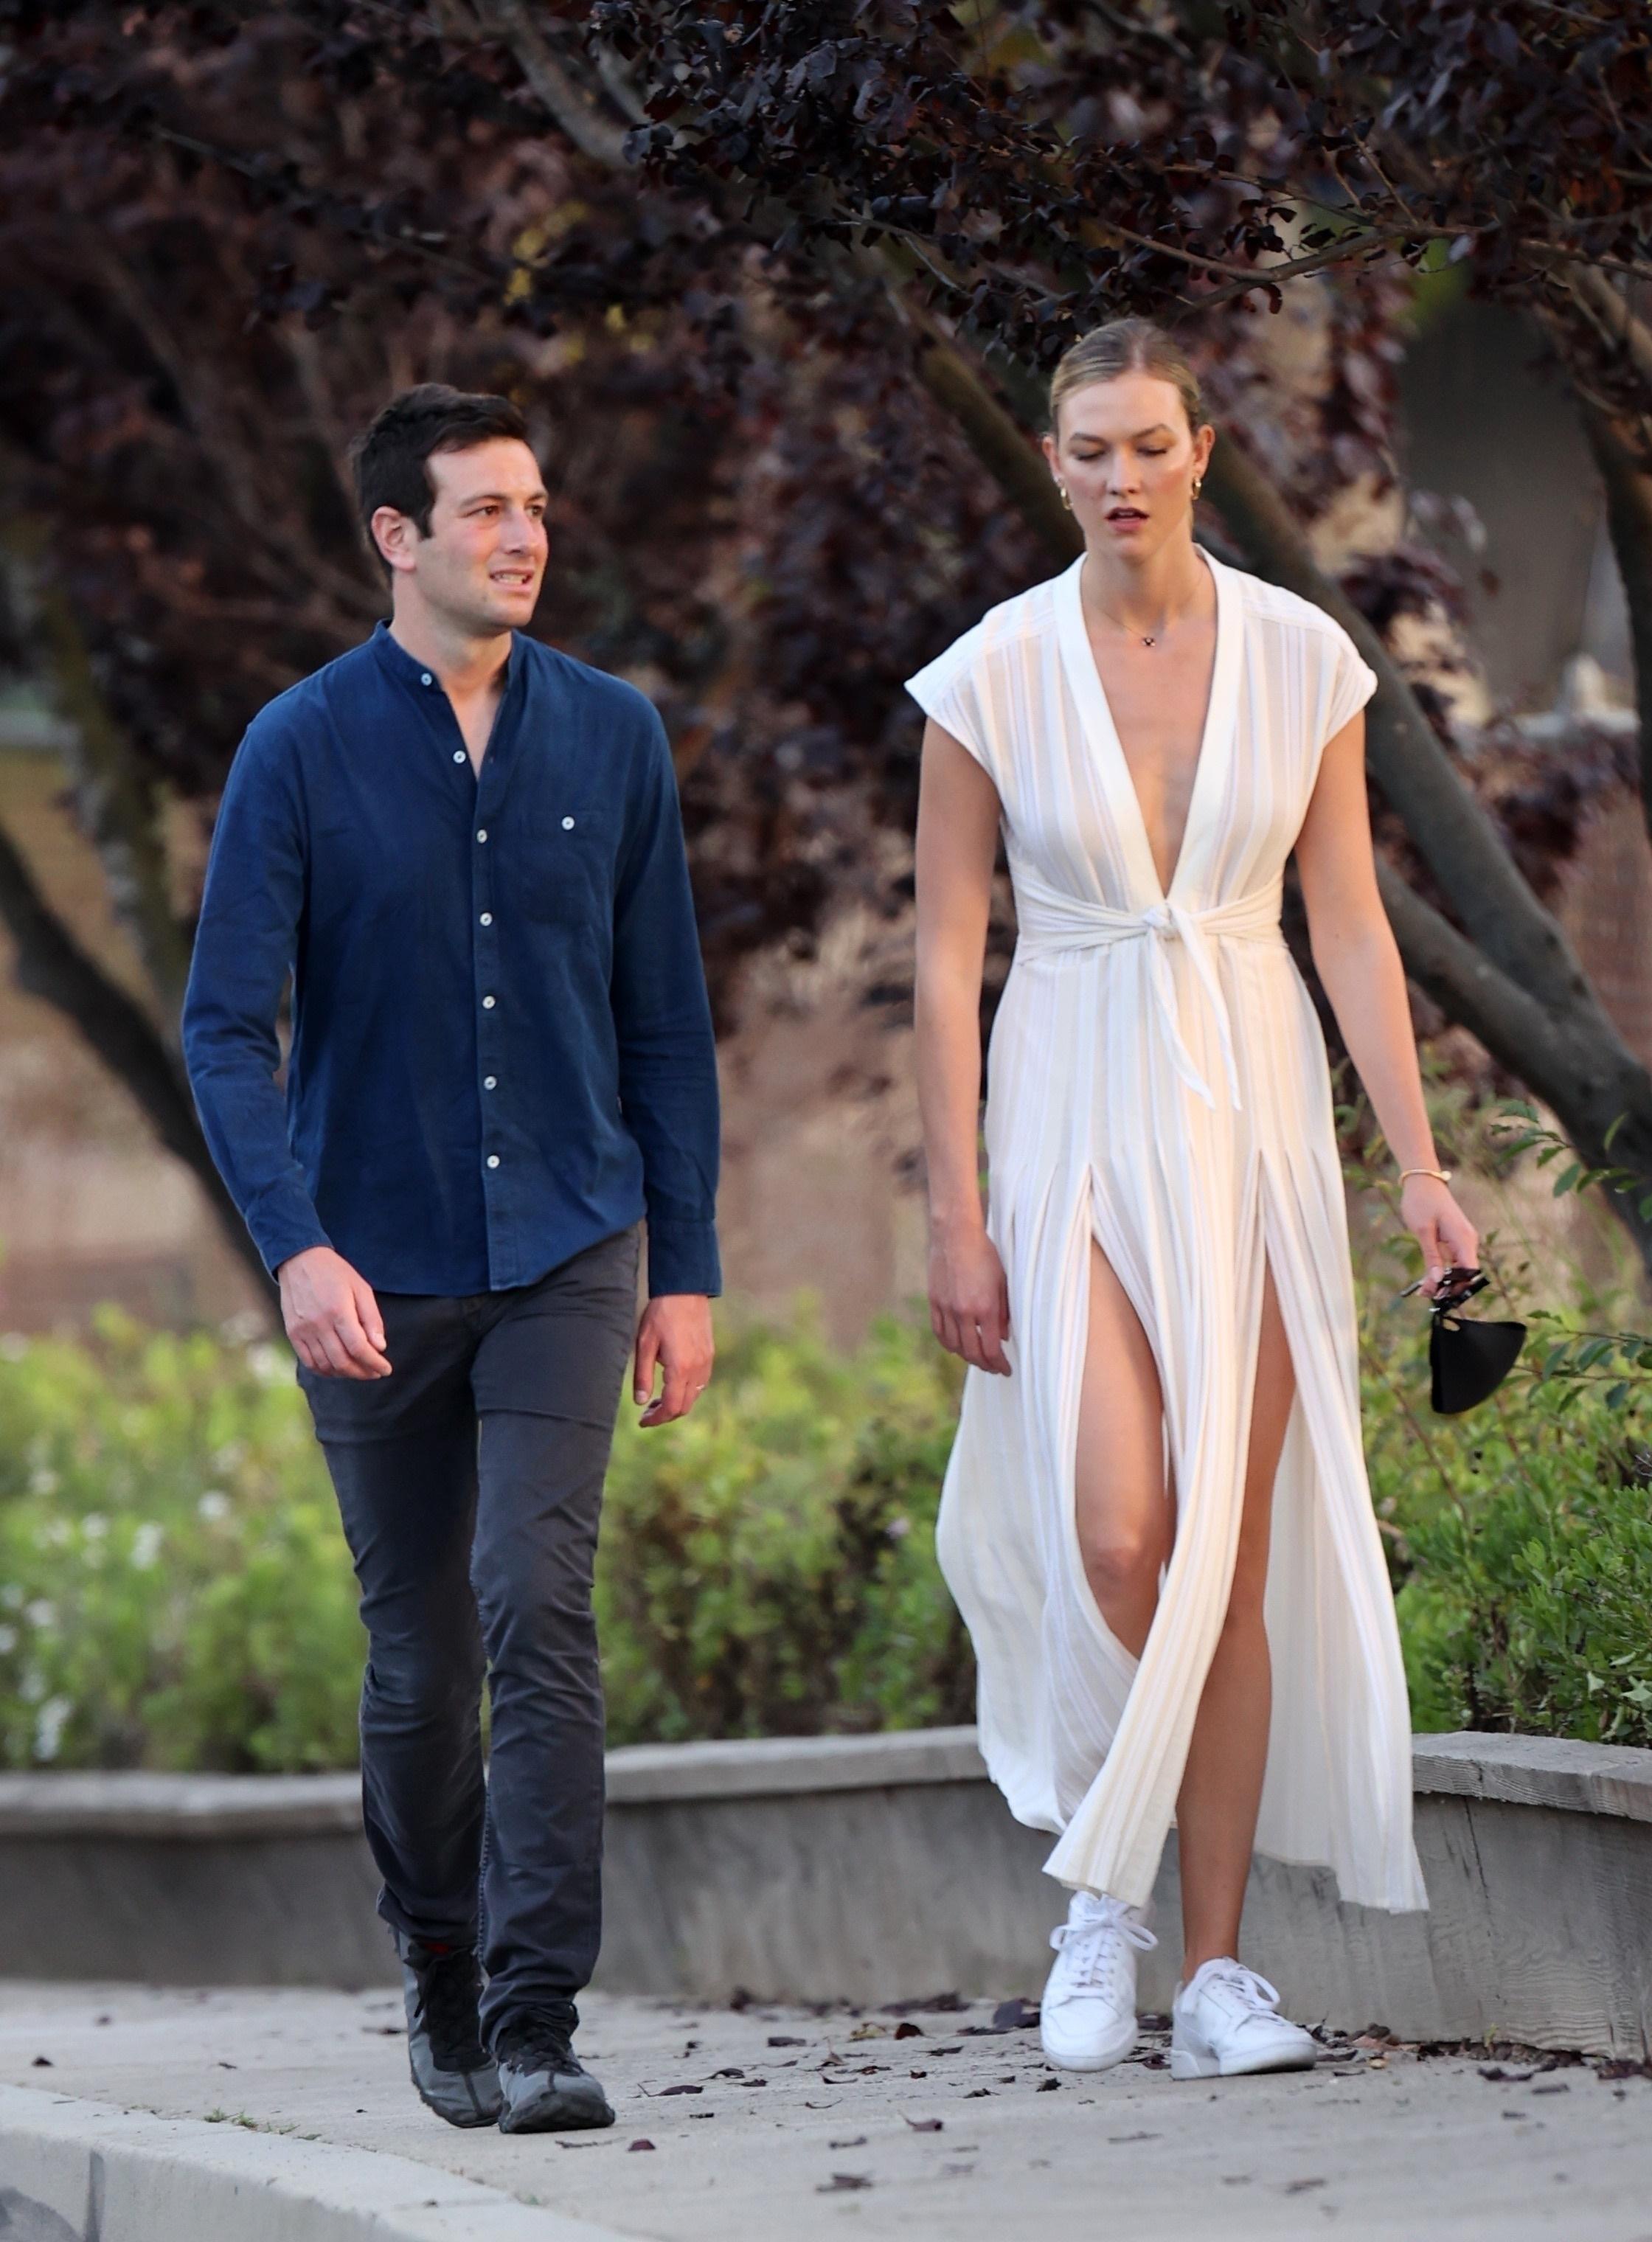 Karlie Kloss and hubby Joshua Kushner enjoy a romantic walk together